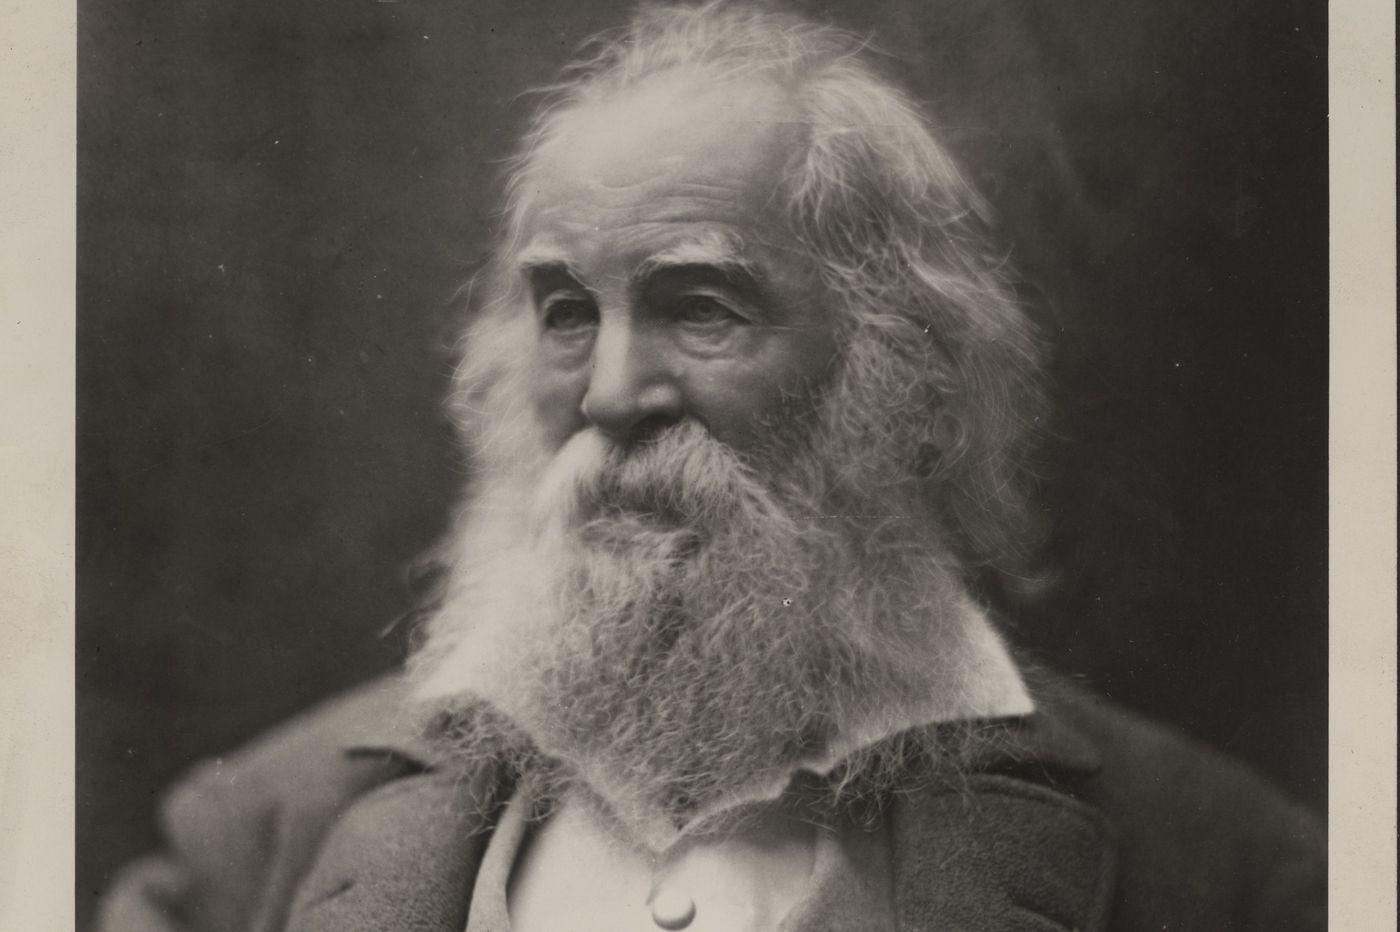 Walt Whitman bicentennial celebration kicks into high gear for his birthday